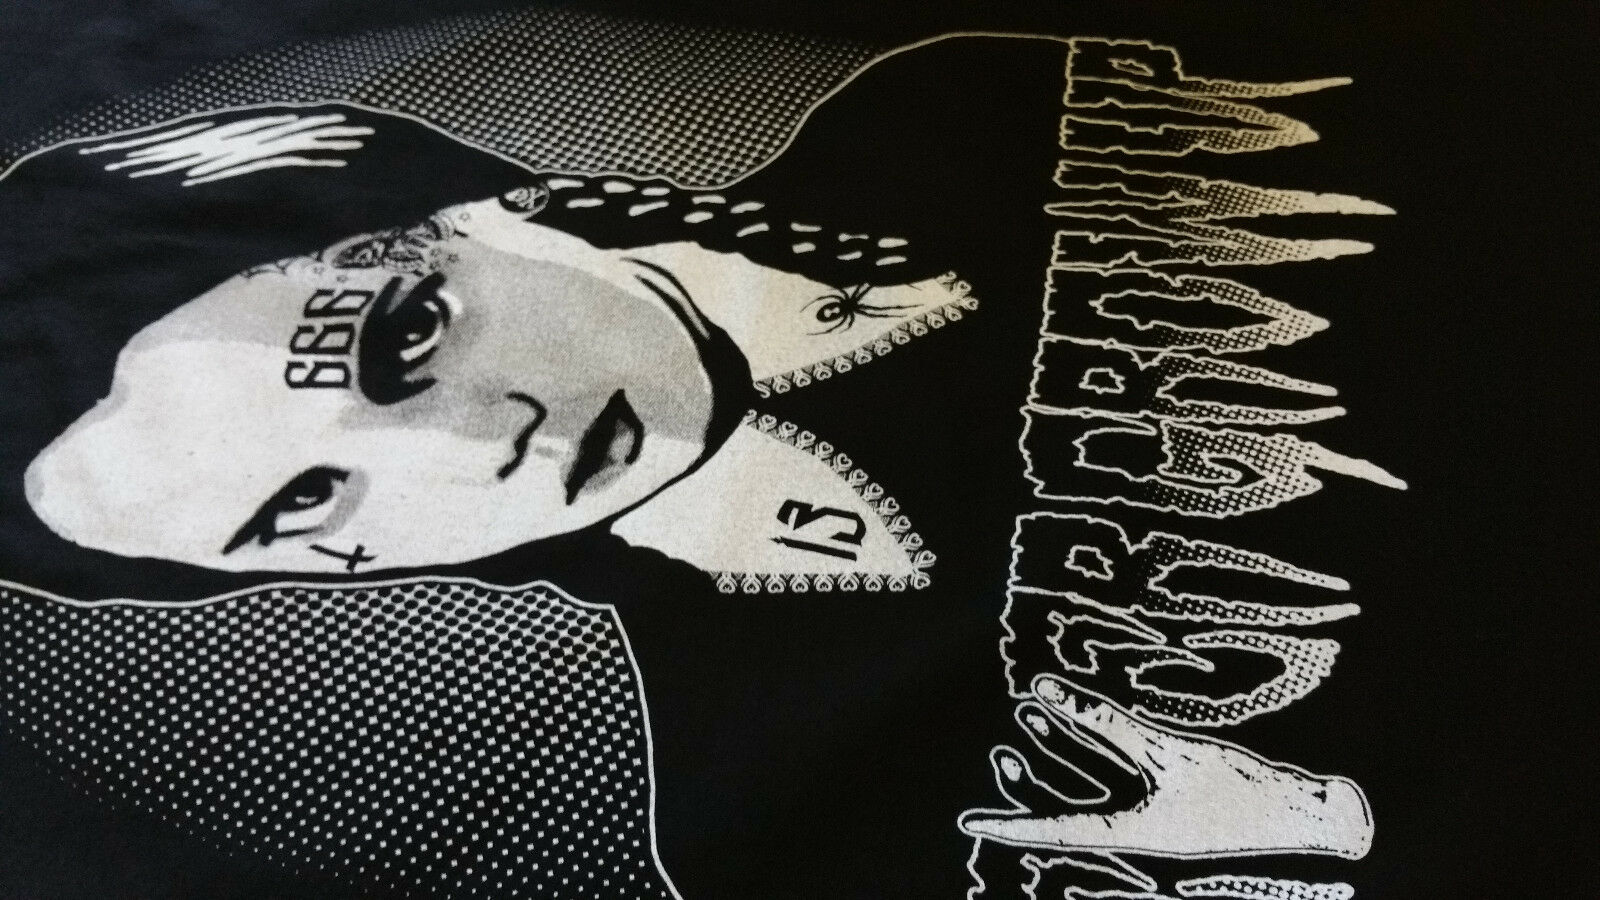 Wednesday Tatuaggio College Giacca Nero/weisstattoo PIN culto, FASHION, gothic, emo, PIN Nero/weisstattoo UP dc77e9